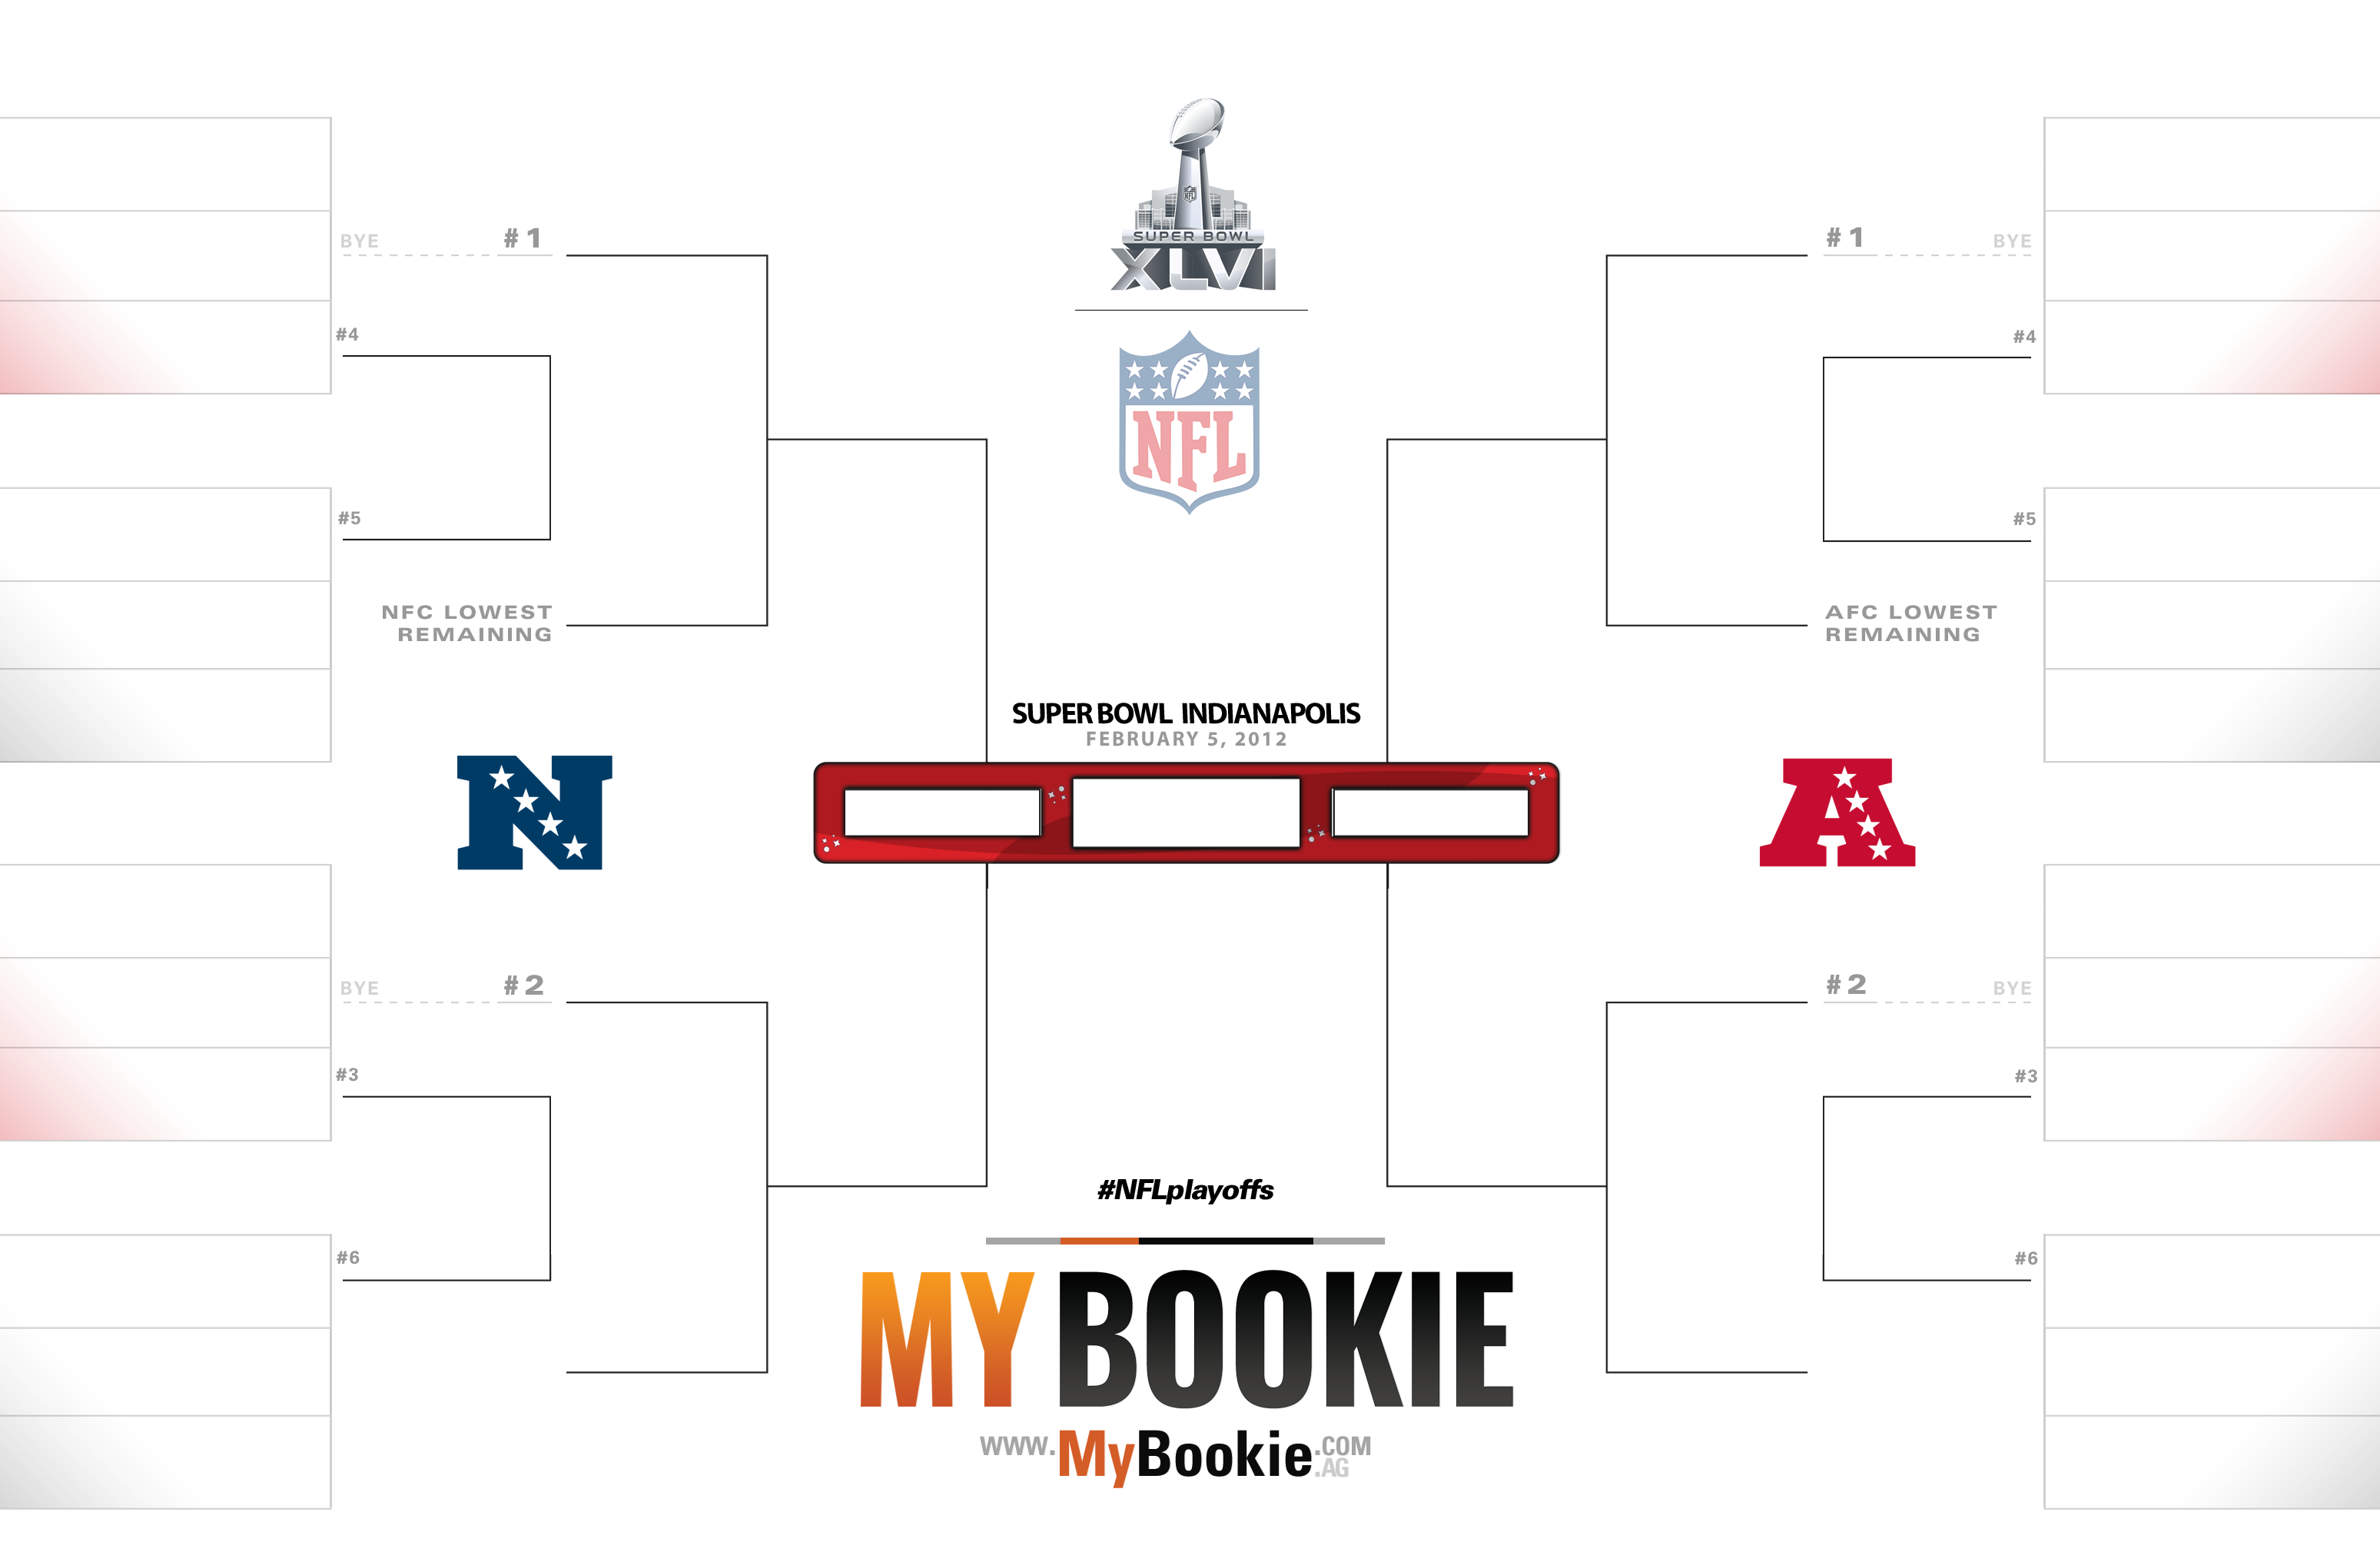 NFL Playoffs / Superbowl 2012 Printable Bracket